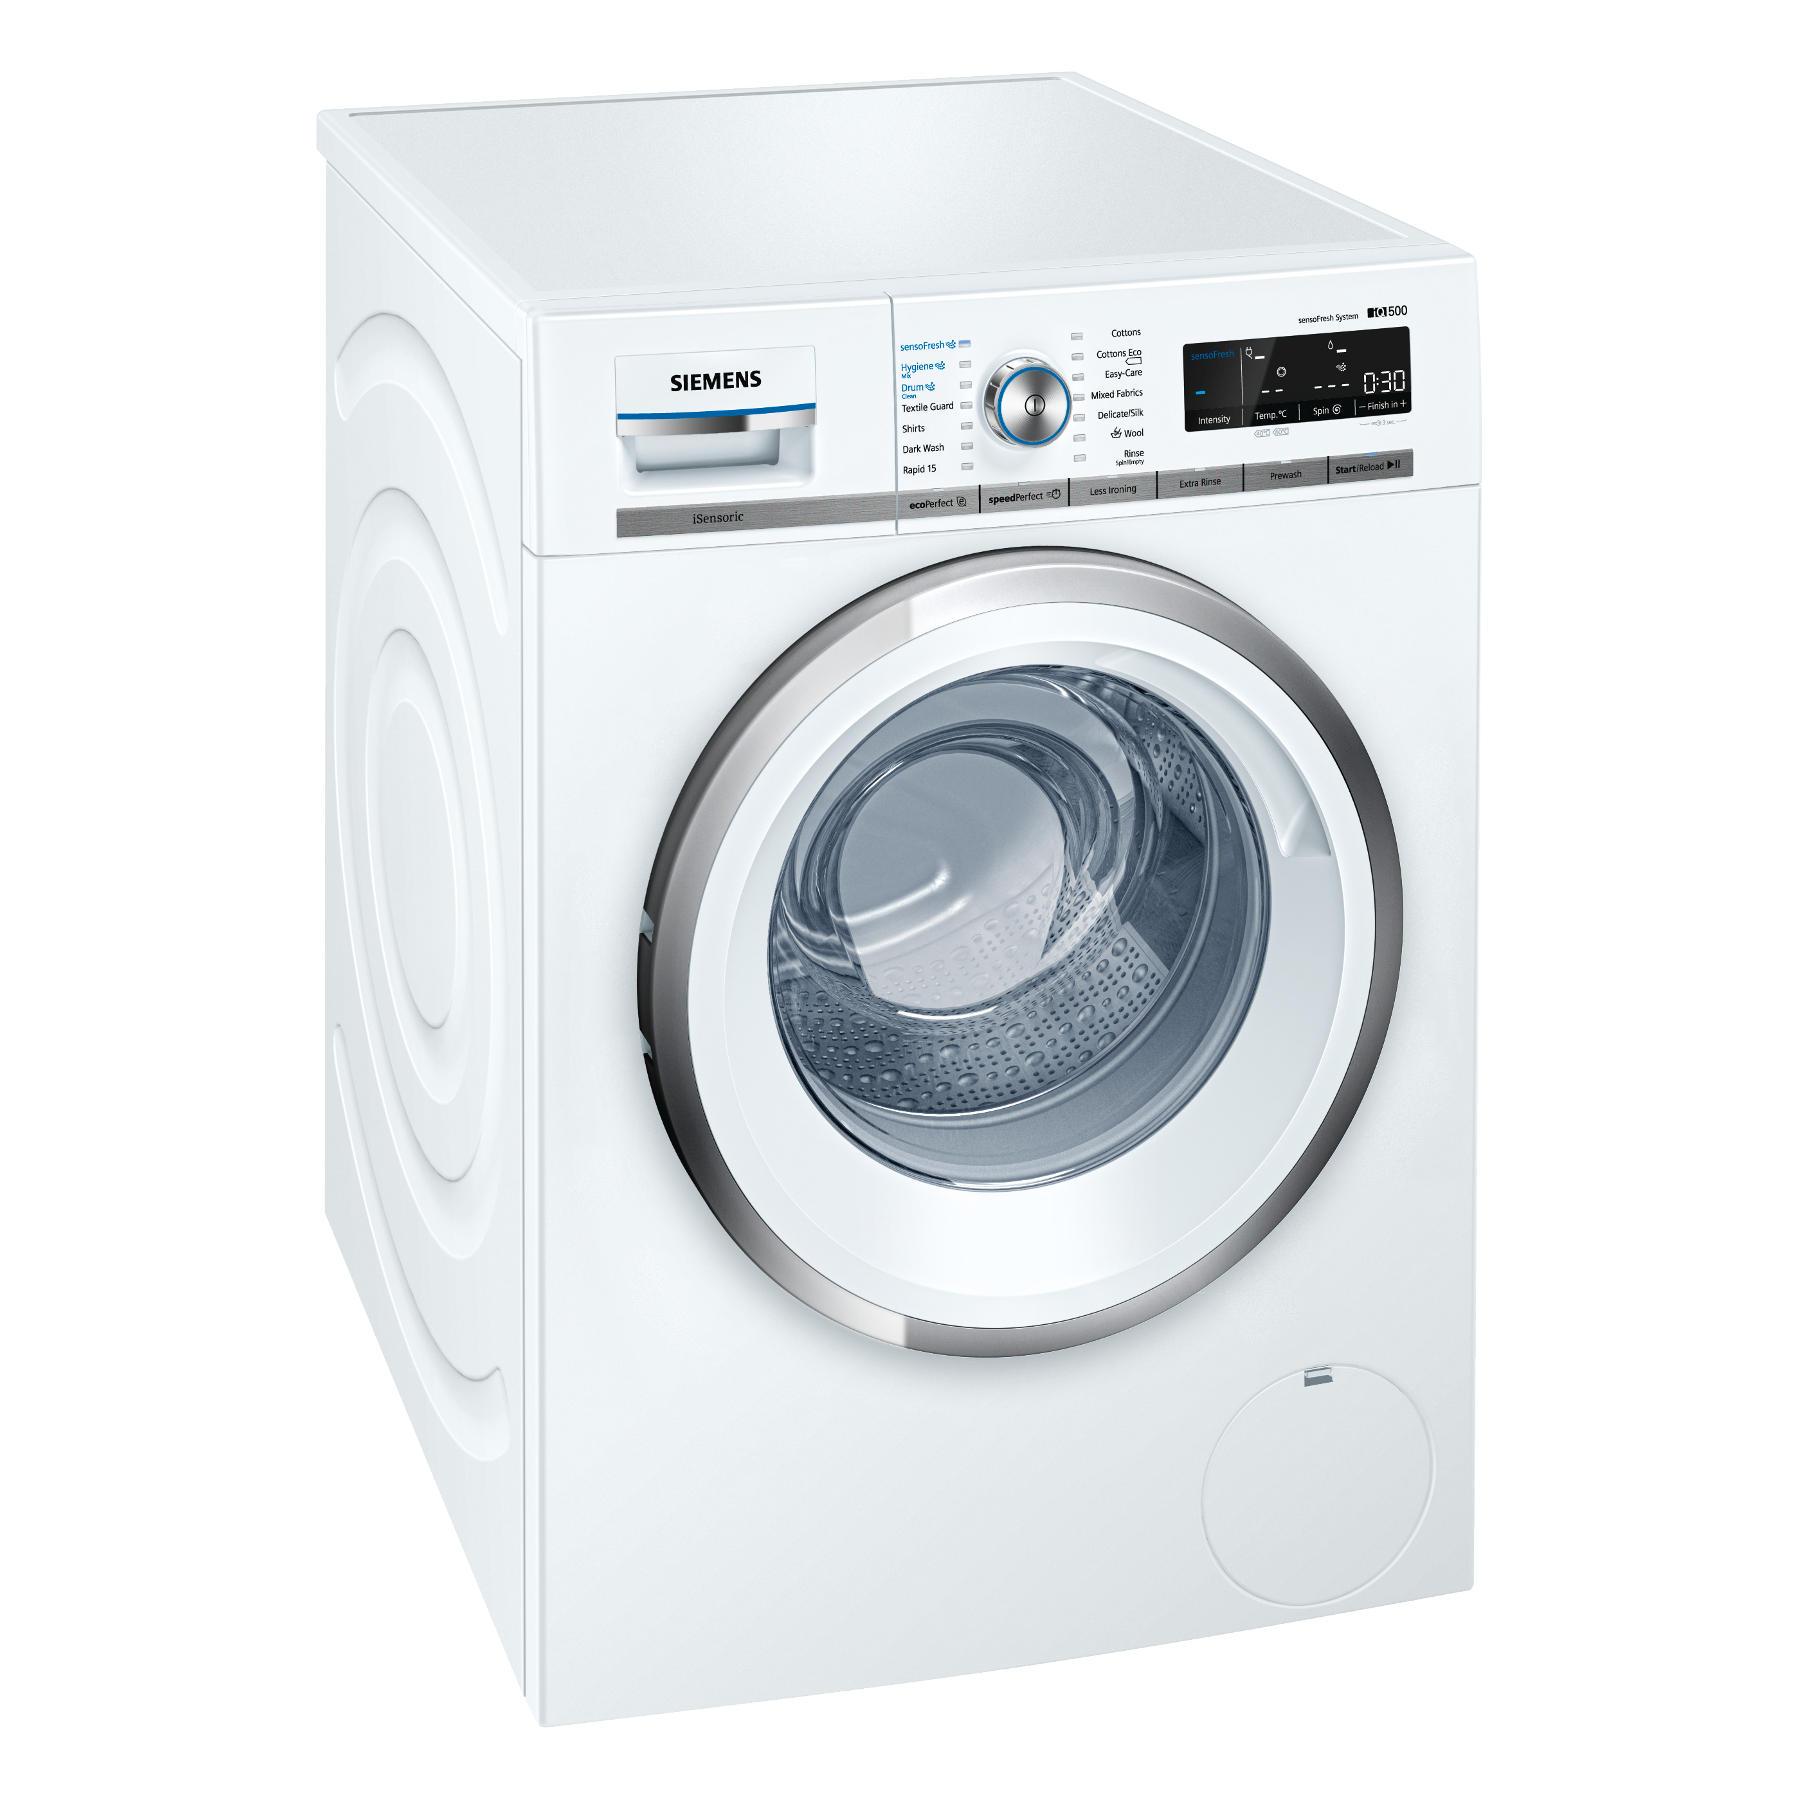 Siemens WM14W750GB iQ500 Front loading automatic washing machine